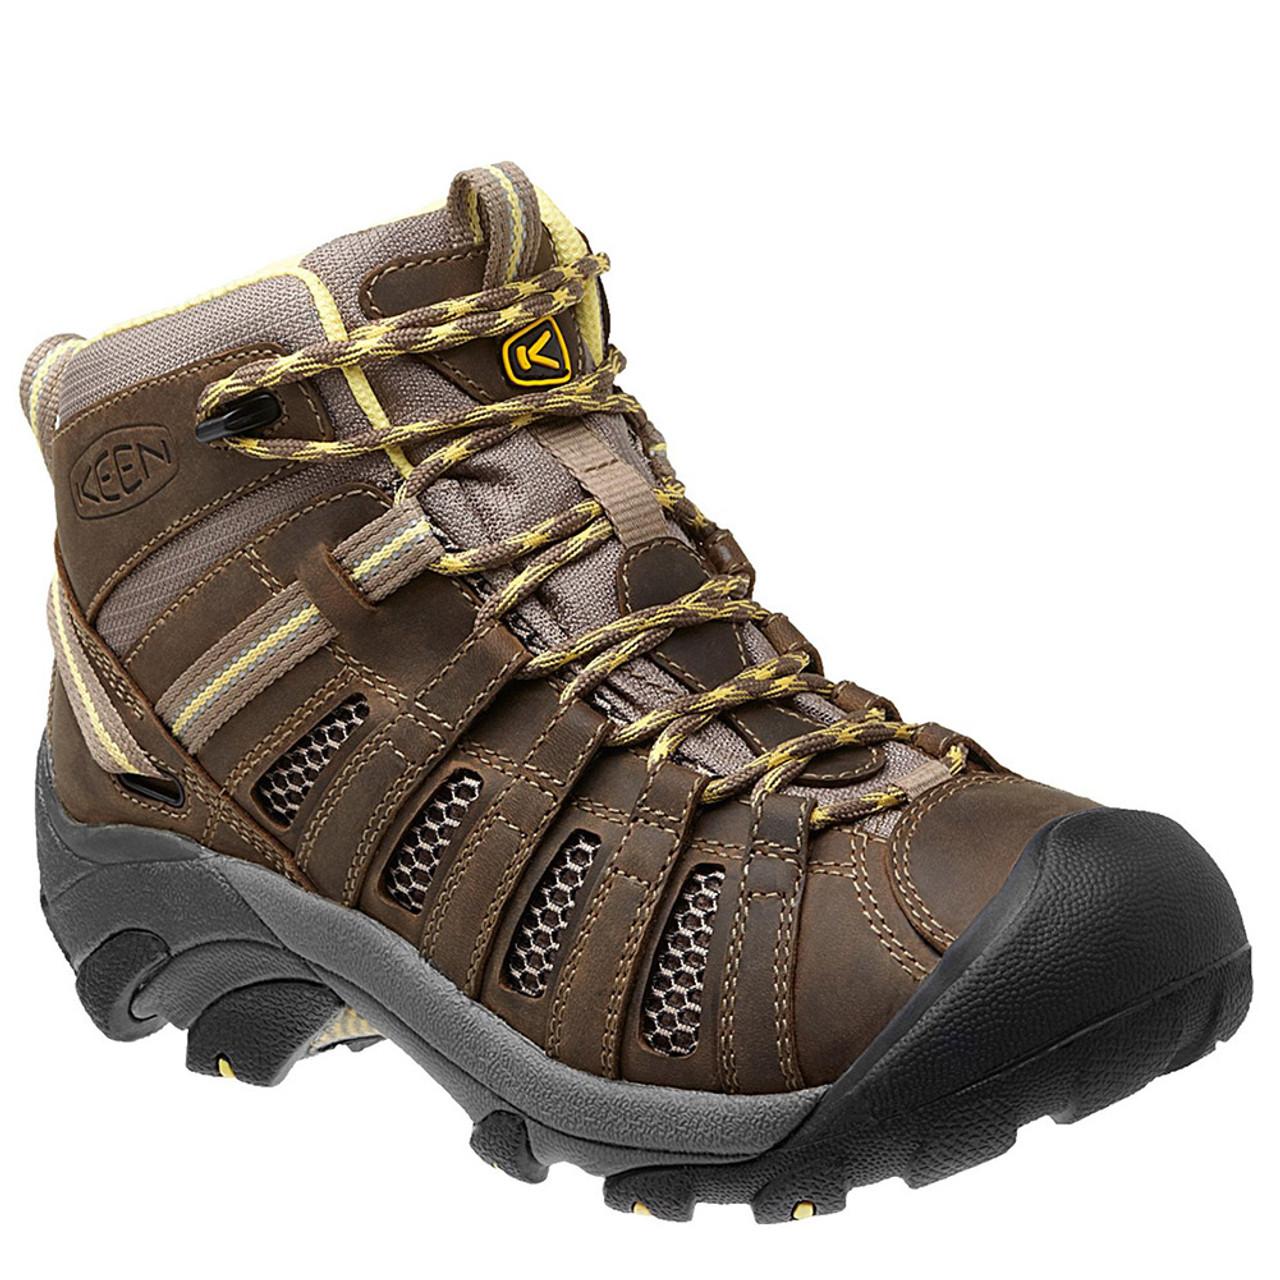 Original Keen Gypsum II Mid Womens Blue Waterproof Outdoors Walking Hiking Boots Shoes | EBay